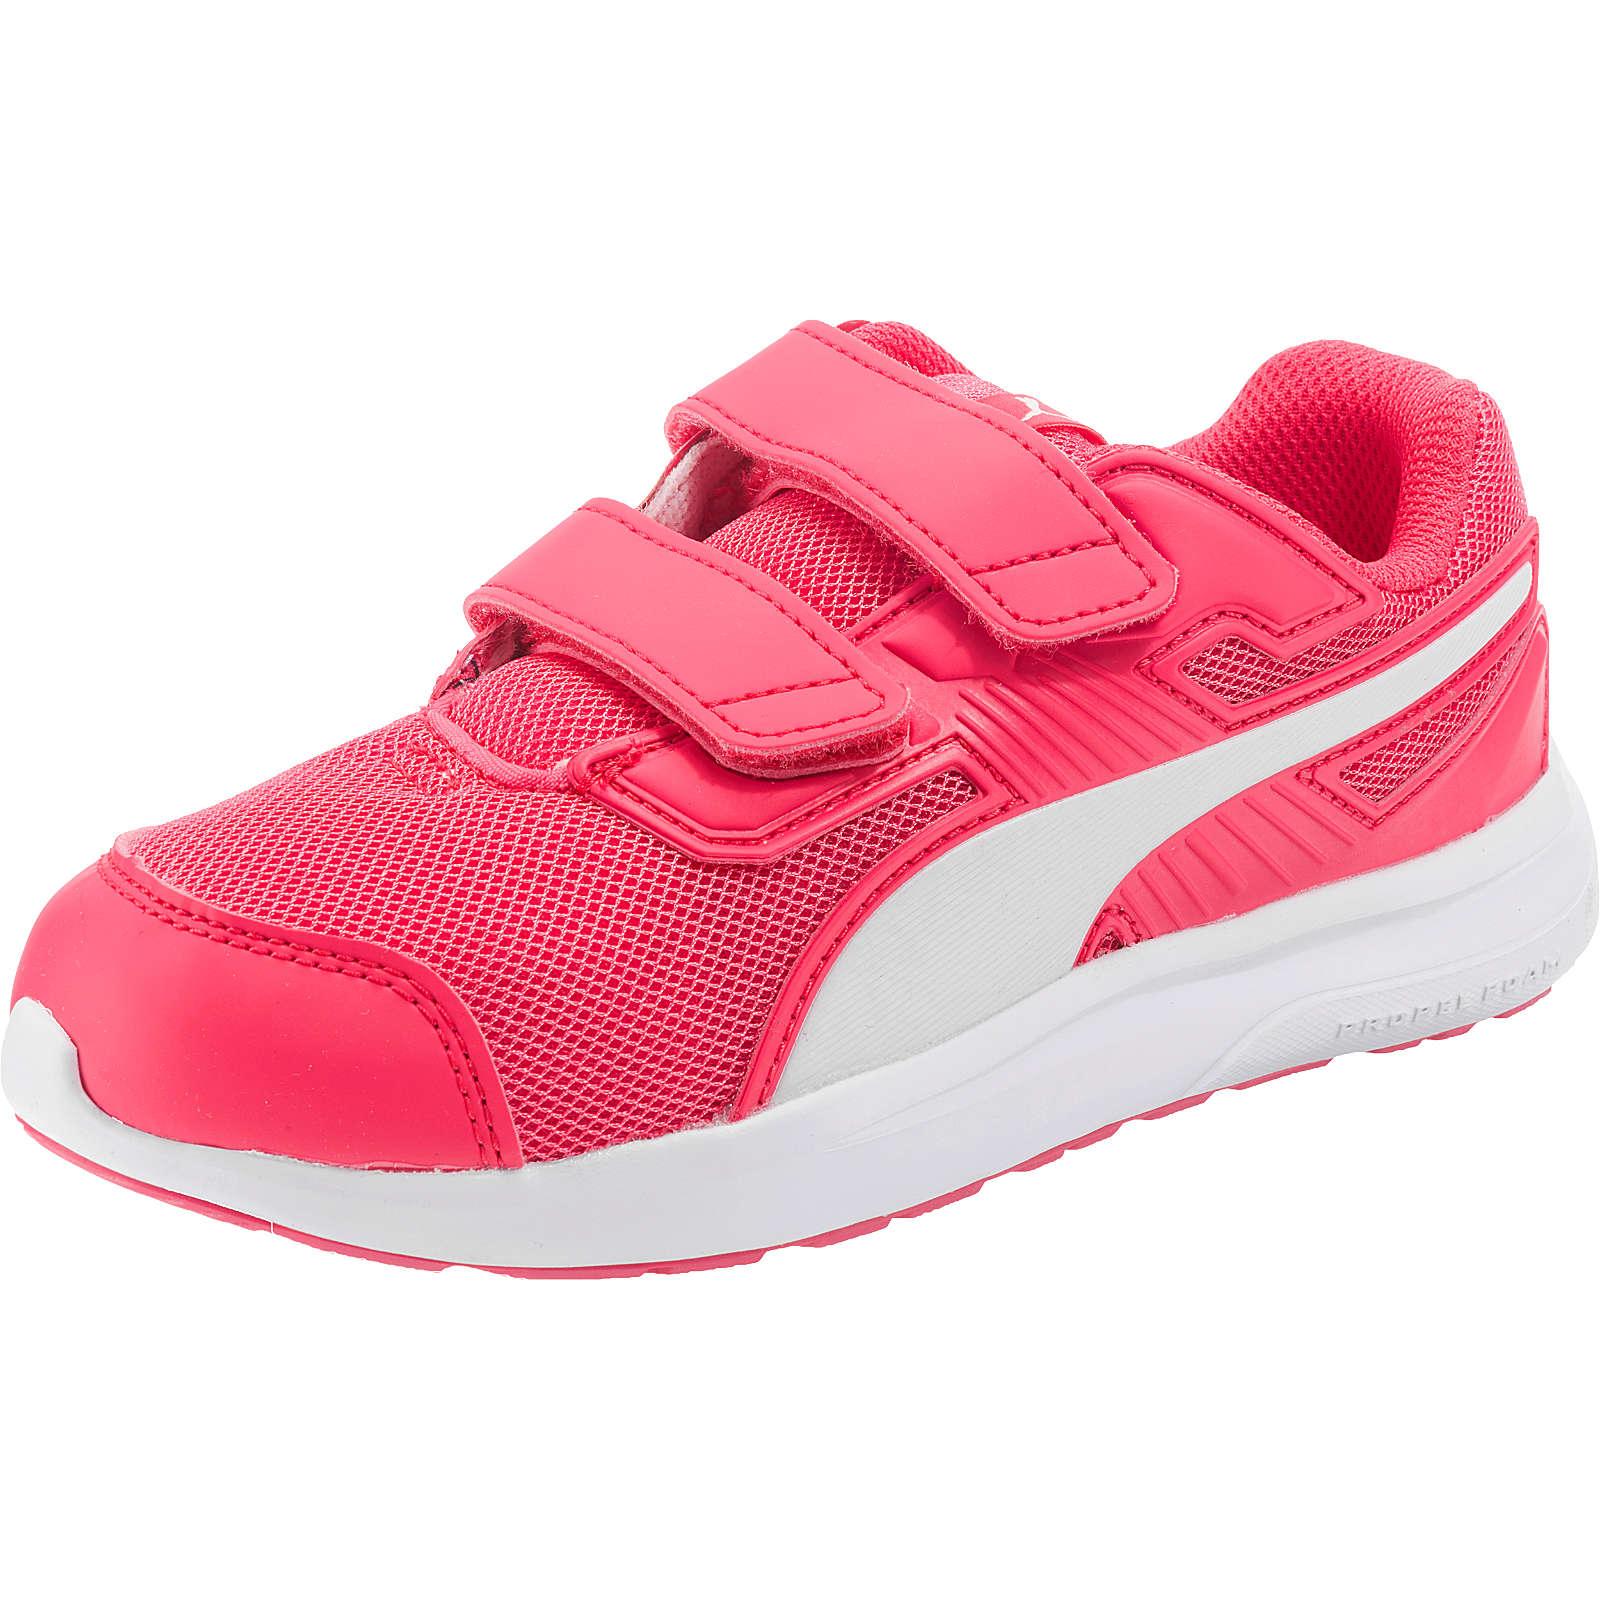 PUMA Kinder Sportschuhe Escaper pink Mädchen Gr. 34